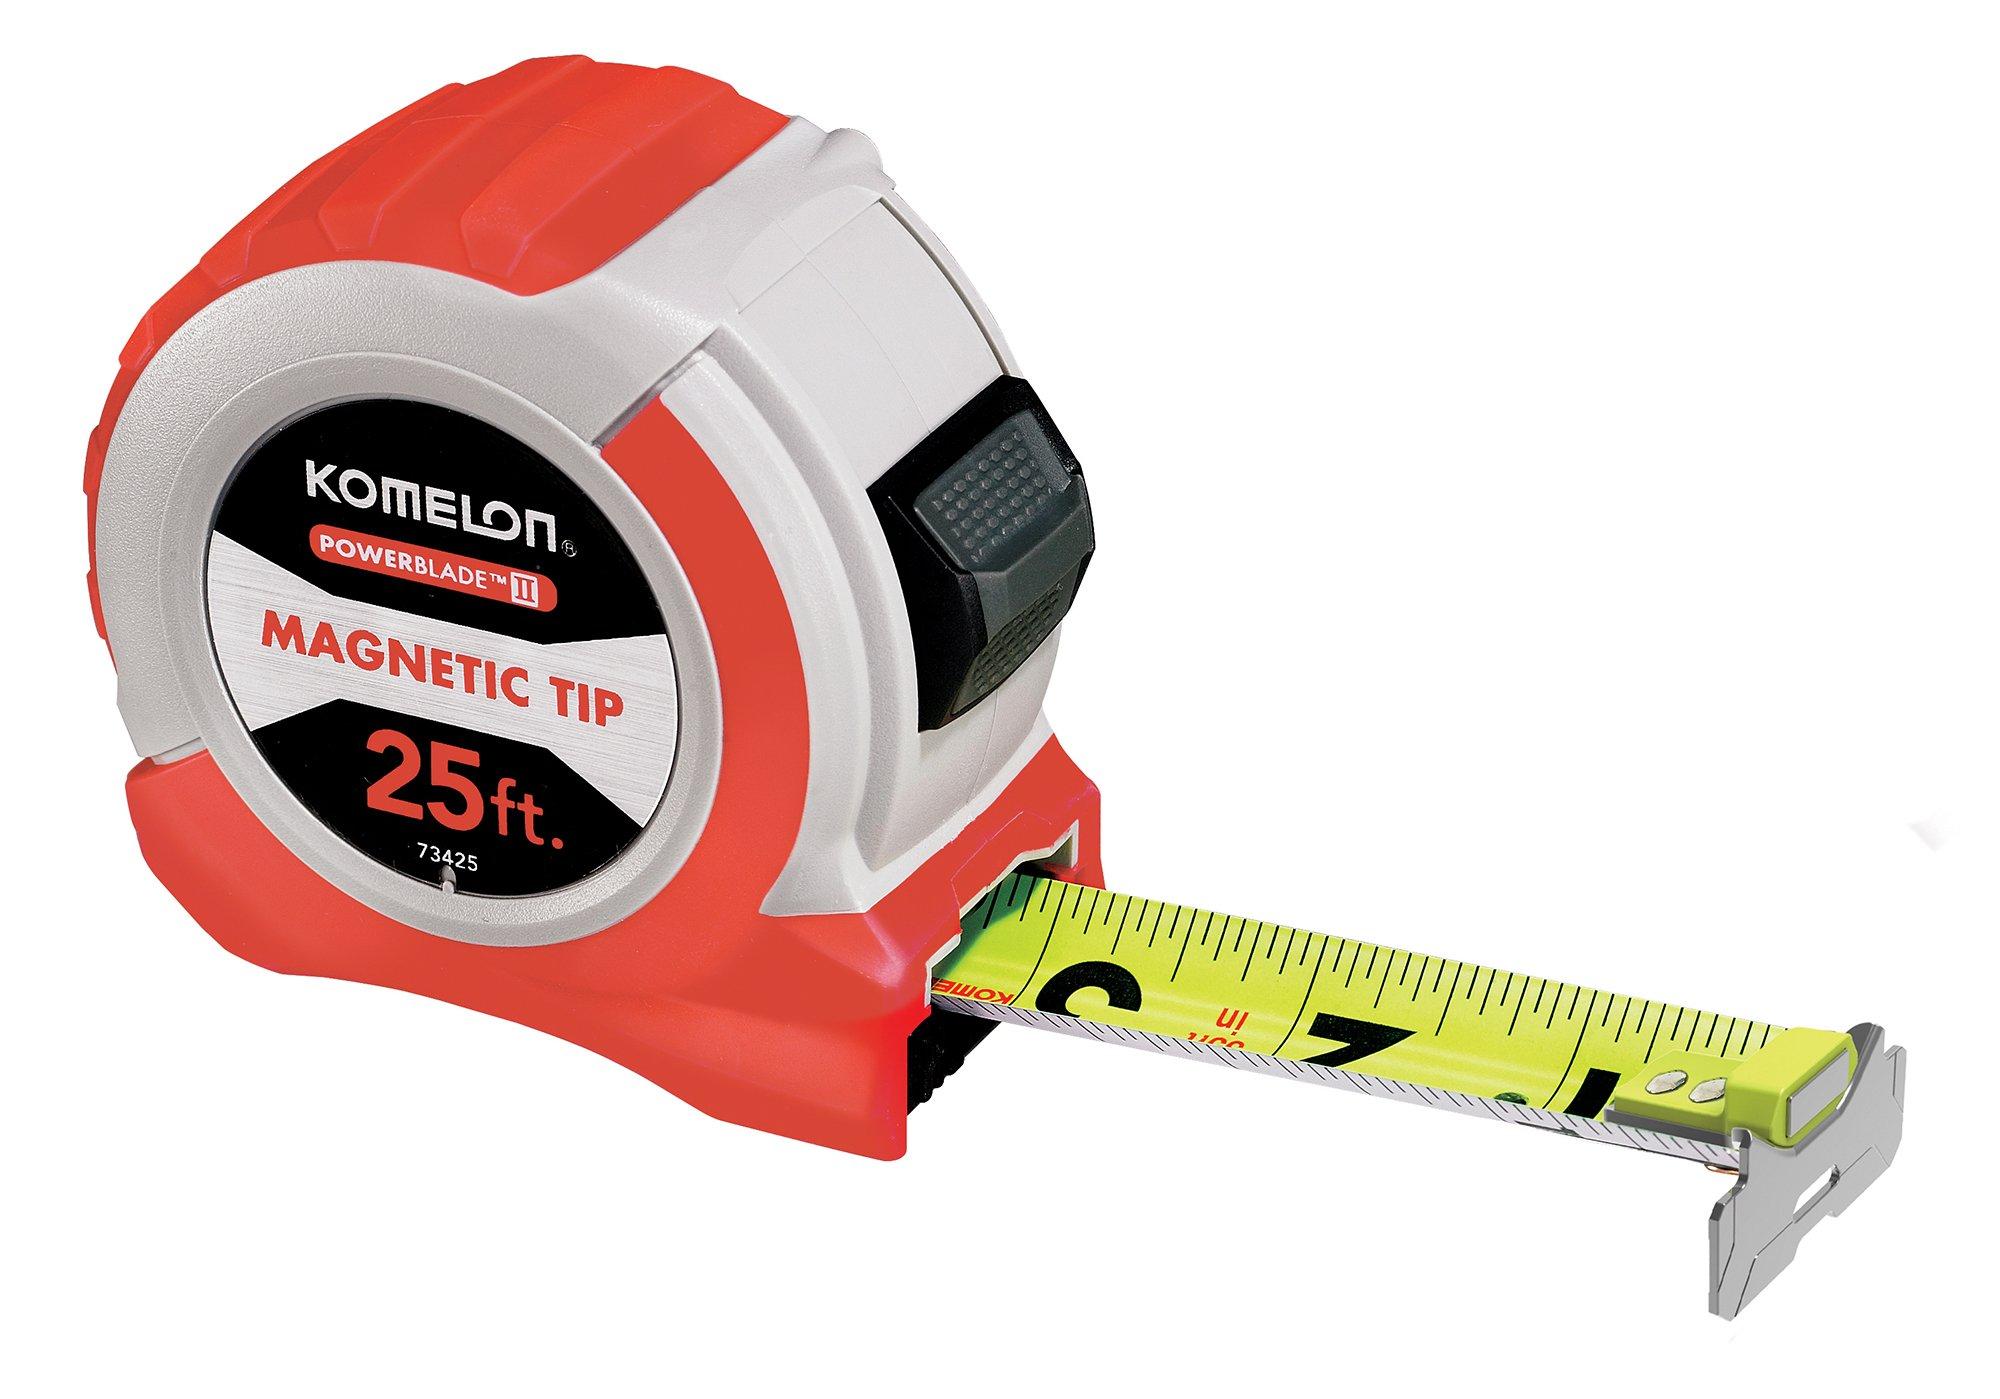 Komelon 73425 25' x 1.06'' Powerblade II Tape Measure